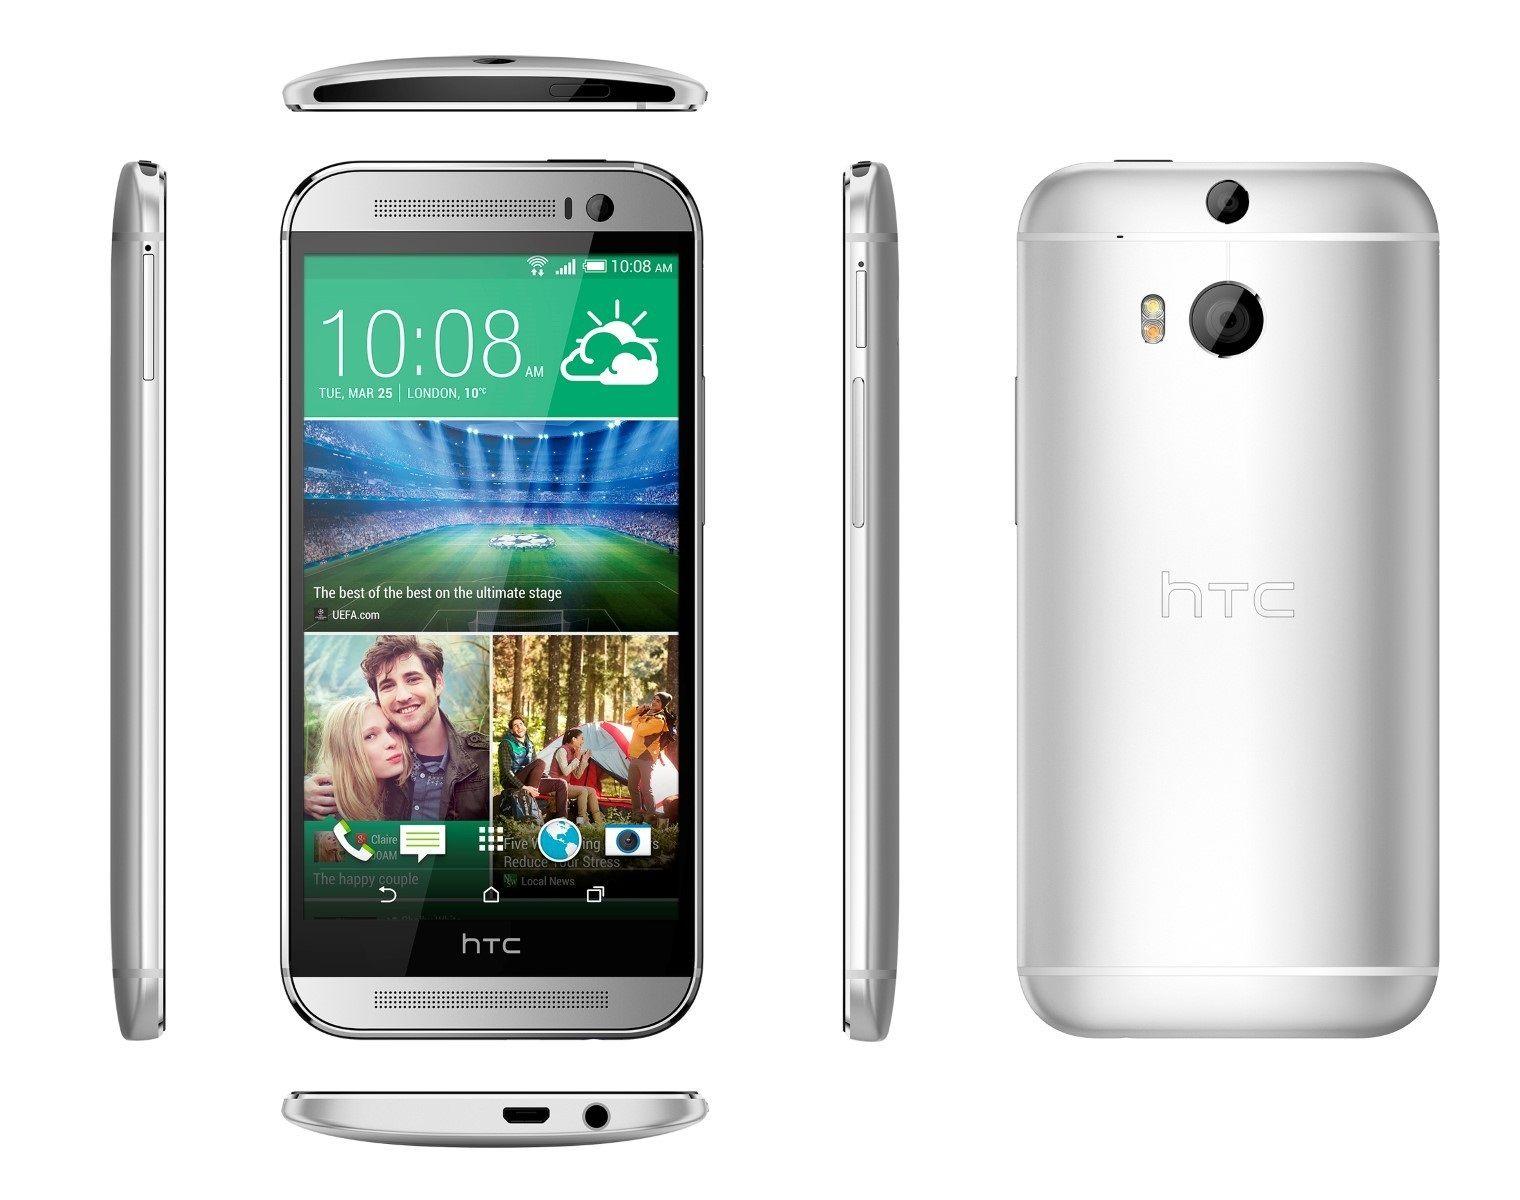 6d046a64a5d003dd916a9d522451143e_htc-one-m8-6v-silver-custom.jpg